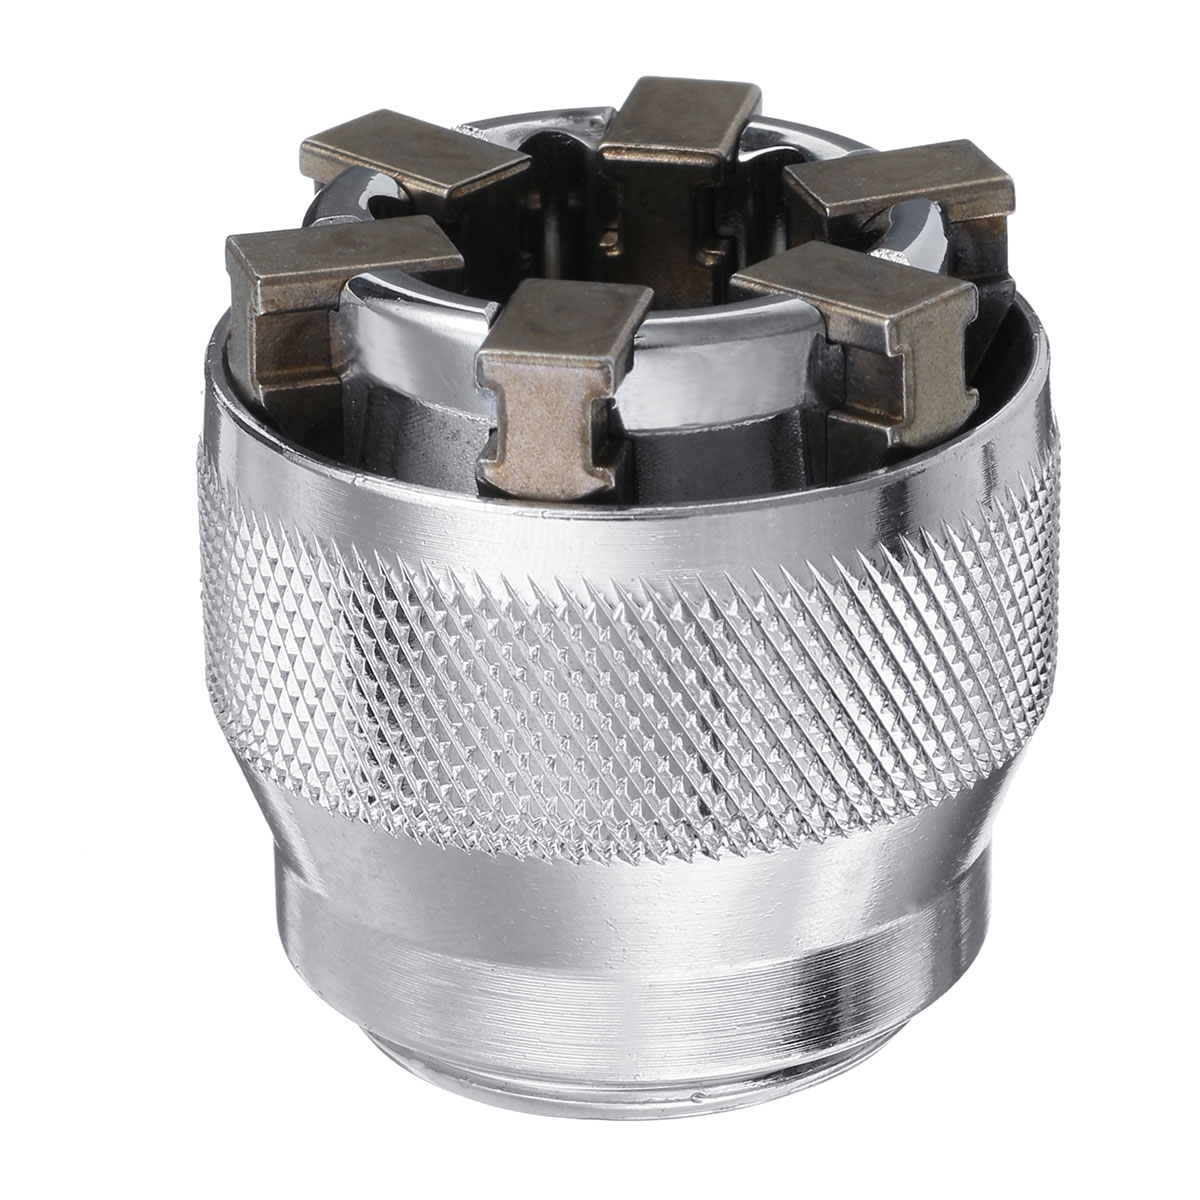 Adjustable 10-19mm Socket Pro Magical Socket Wrench Multifunction Sleeve Wrench